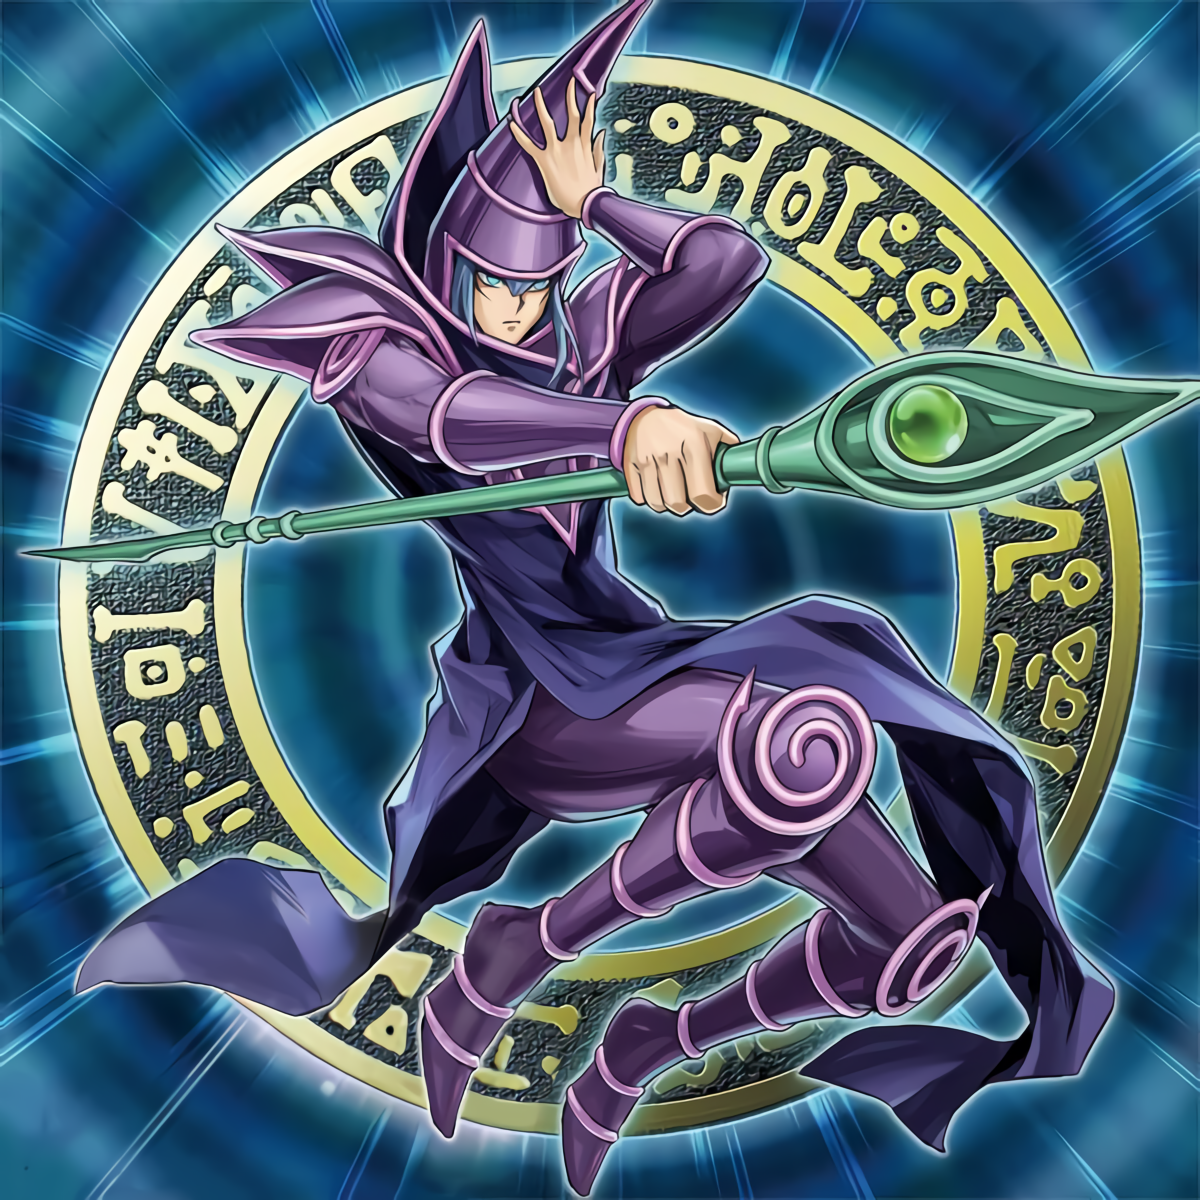 Dark Magician Rush Duel By Omgitsjohannes On Deviantart Dark Magician Cards The Magicians Yugioh Monsters